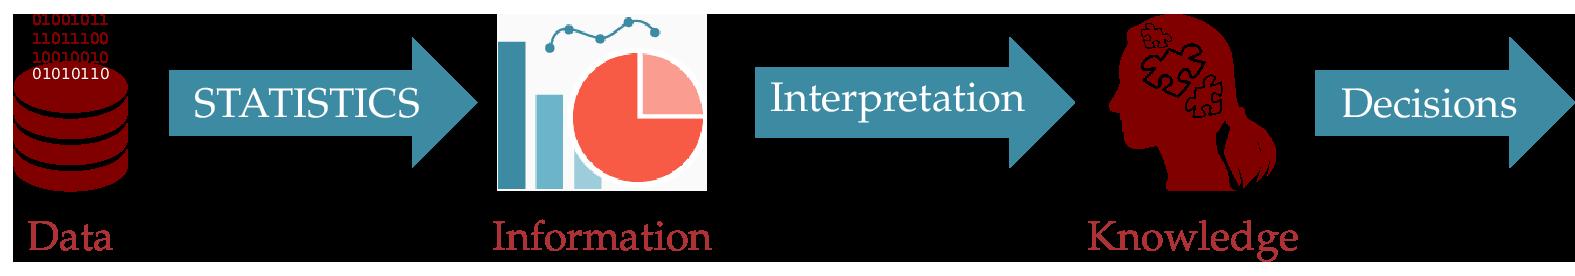 Statistics clipart data analysis interpretation. Manual aprende con alf